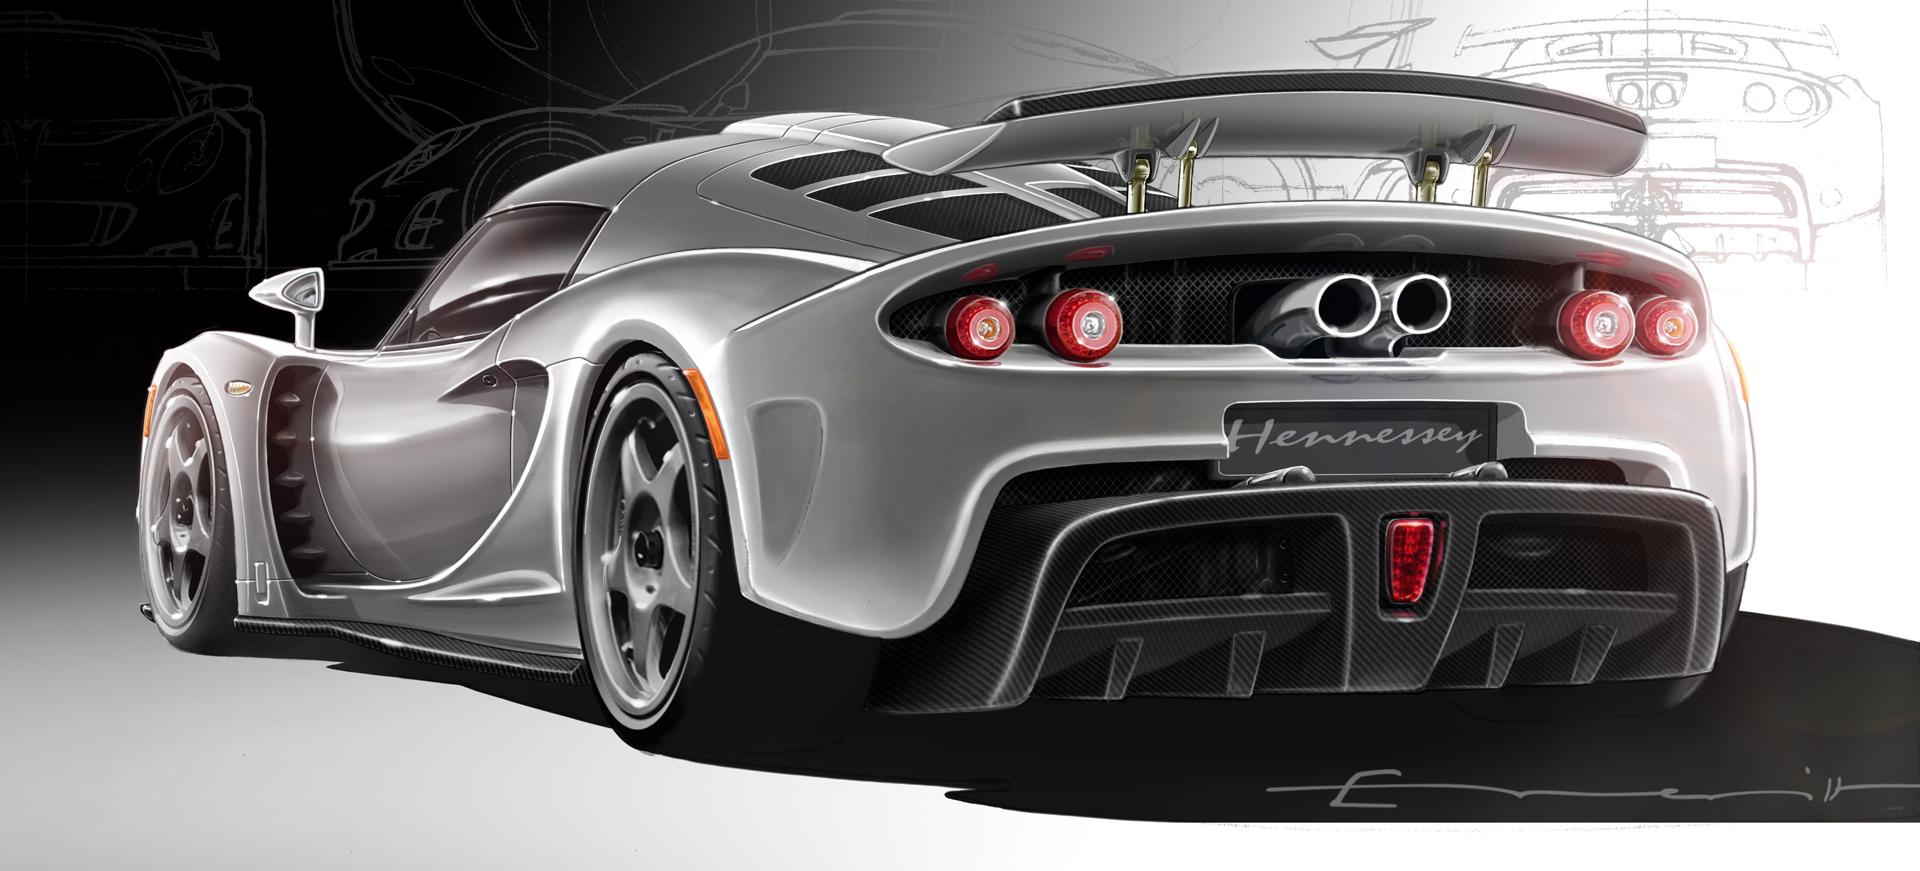 2009 Hennessey Venom GT Concept Images Photo HennesseyVenomGT